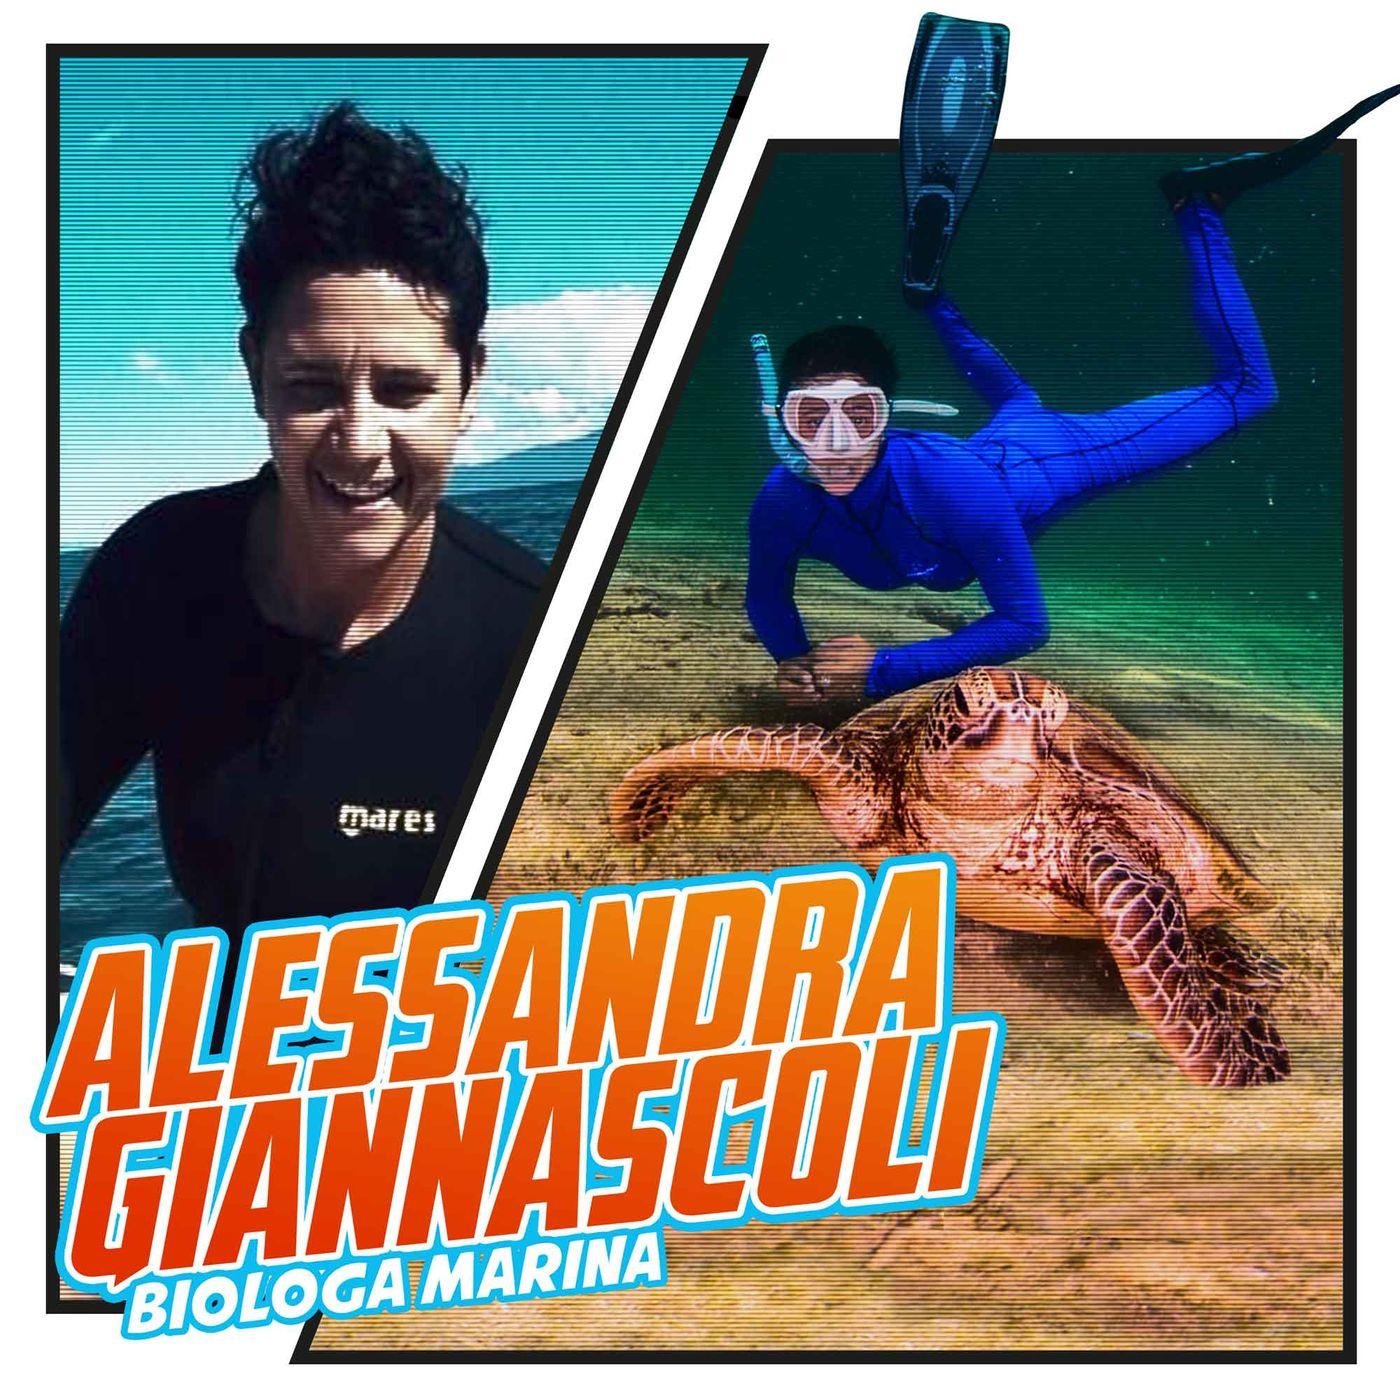 Alessandra Giannascoli